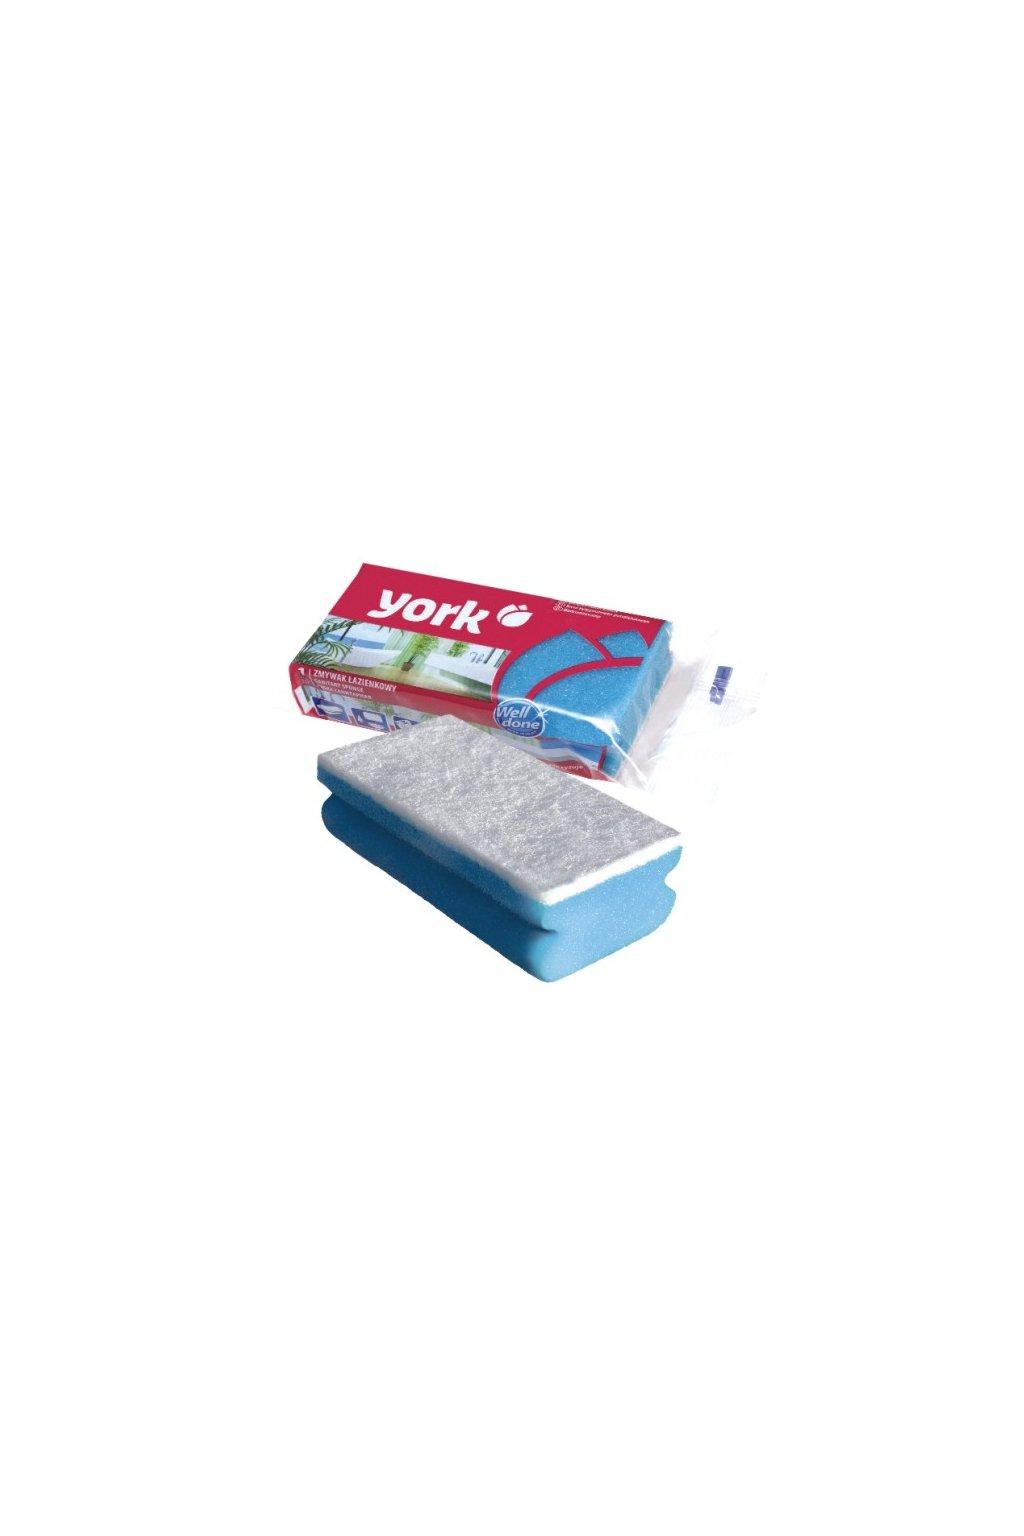 YR3008 york sanitarni tvarovana houba na uklid i nadobi 1ks.